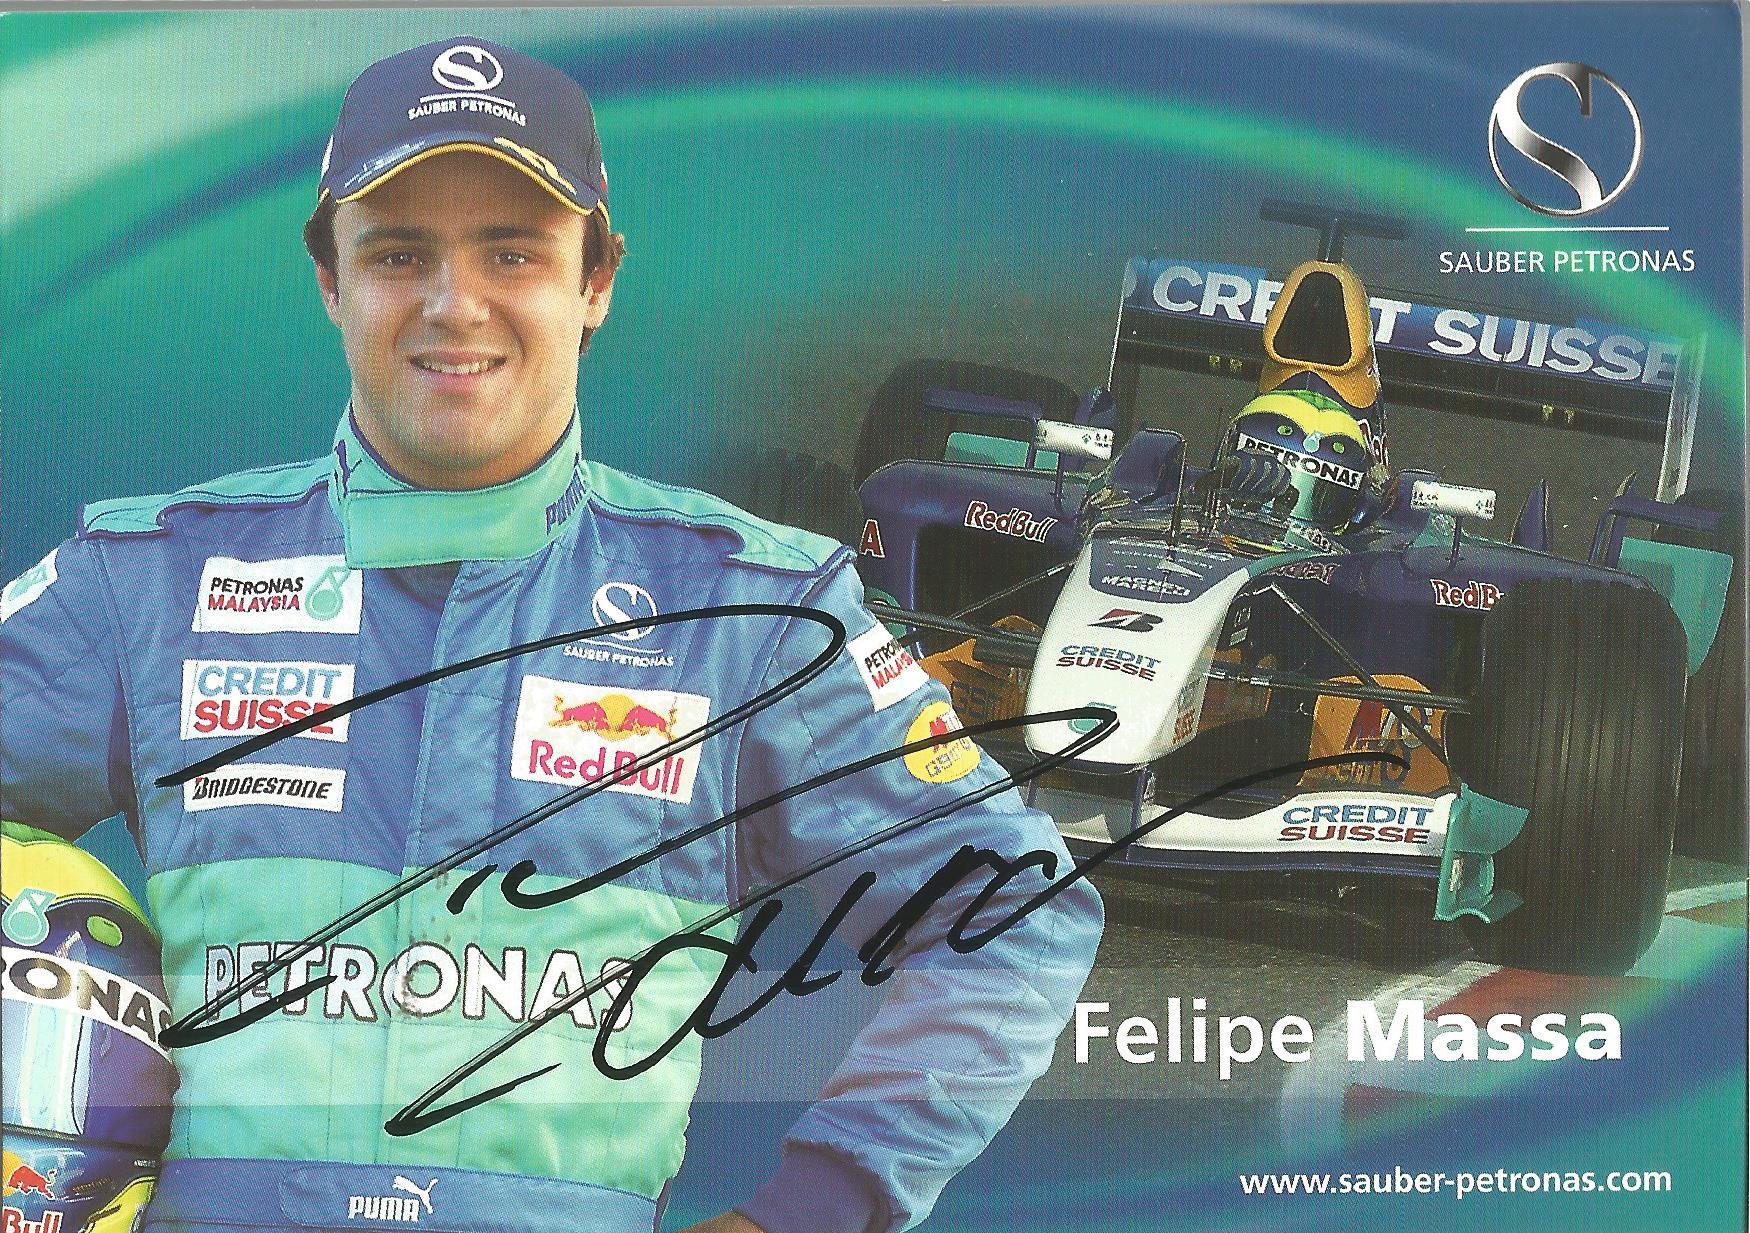 Felipe Massa Signed Sauber Petronas Card